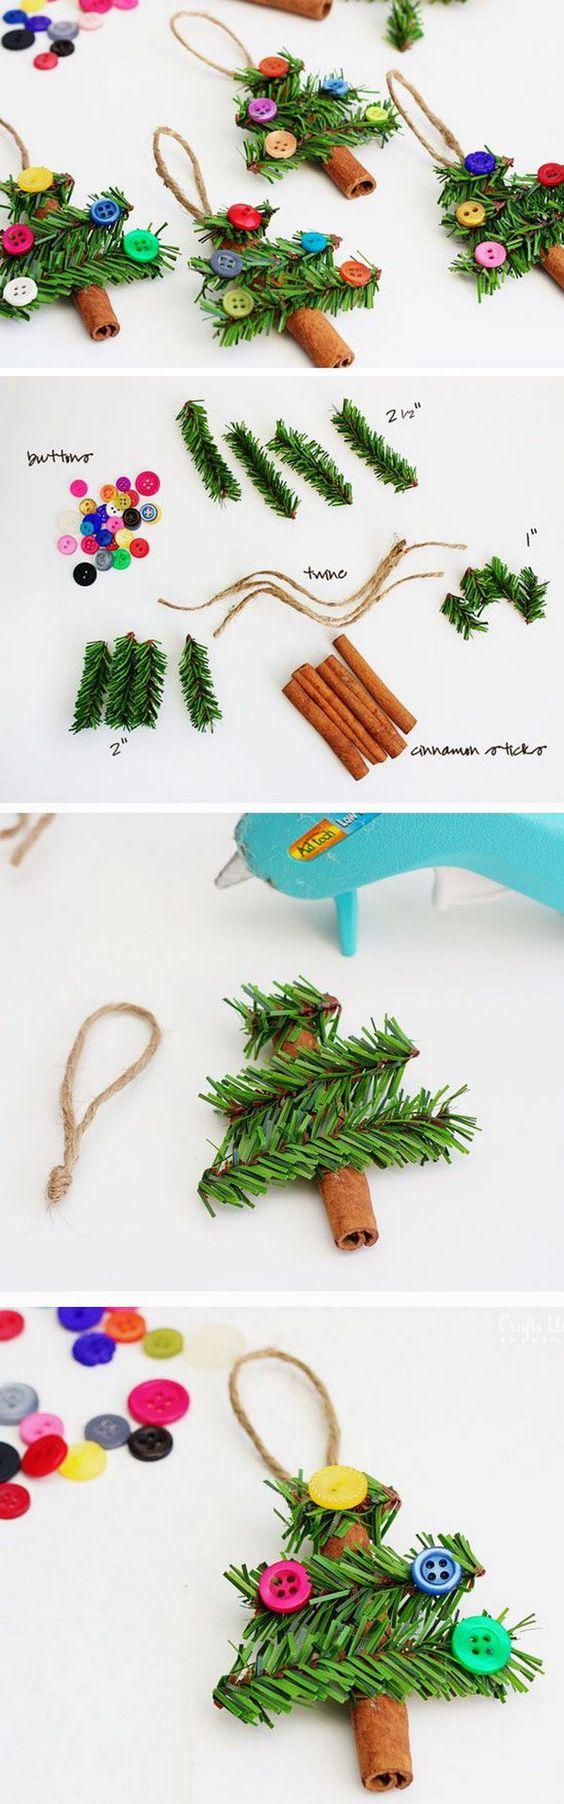 DIY Cinnamon Stick Trees  Ornaments  .